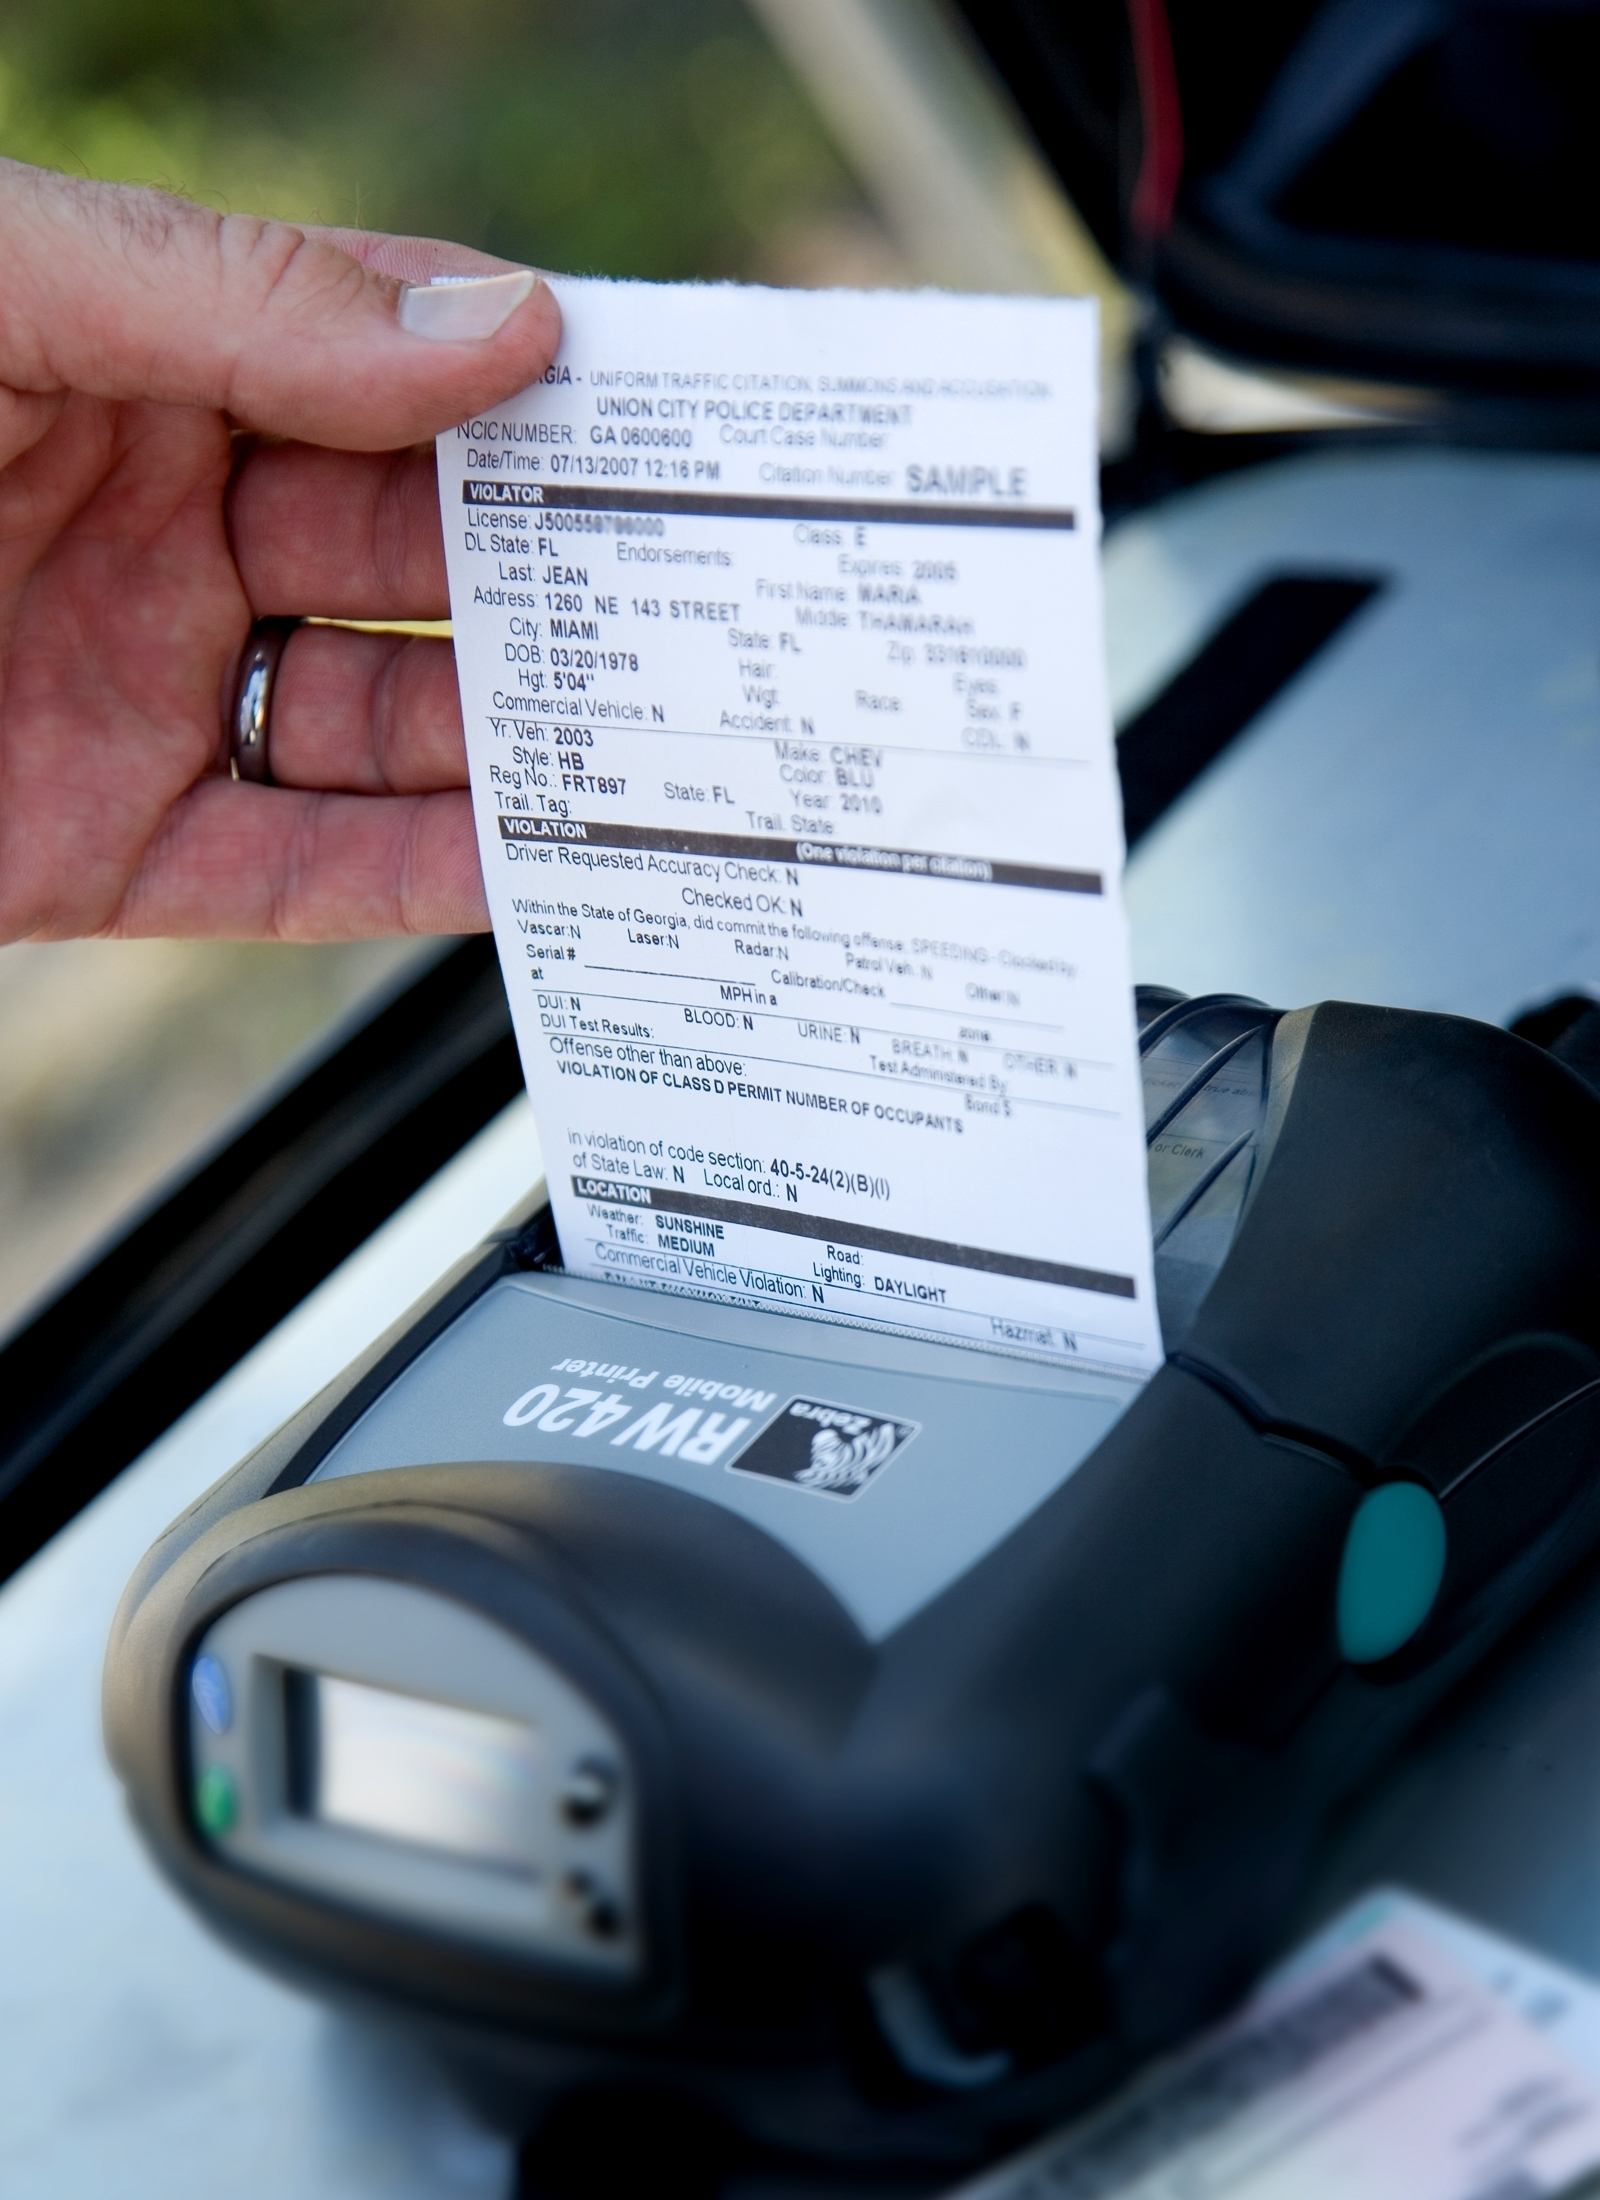 mobile invoice printer uncategorized zebratech 1600 X 2200